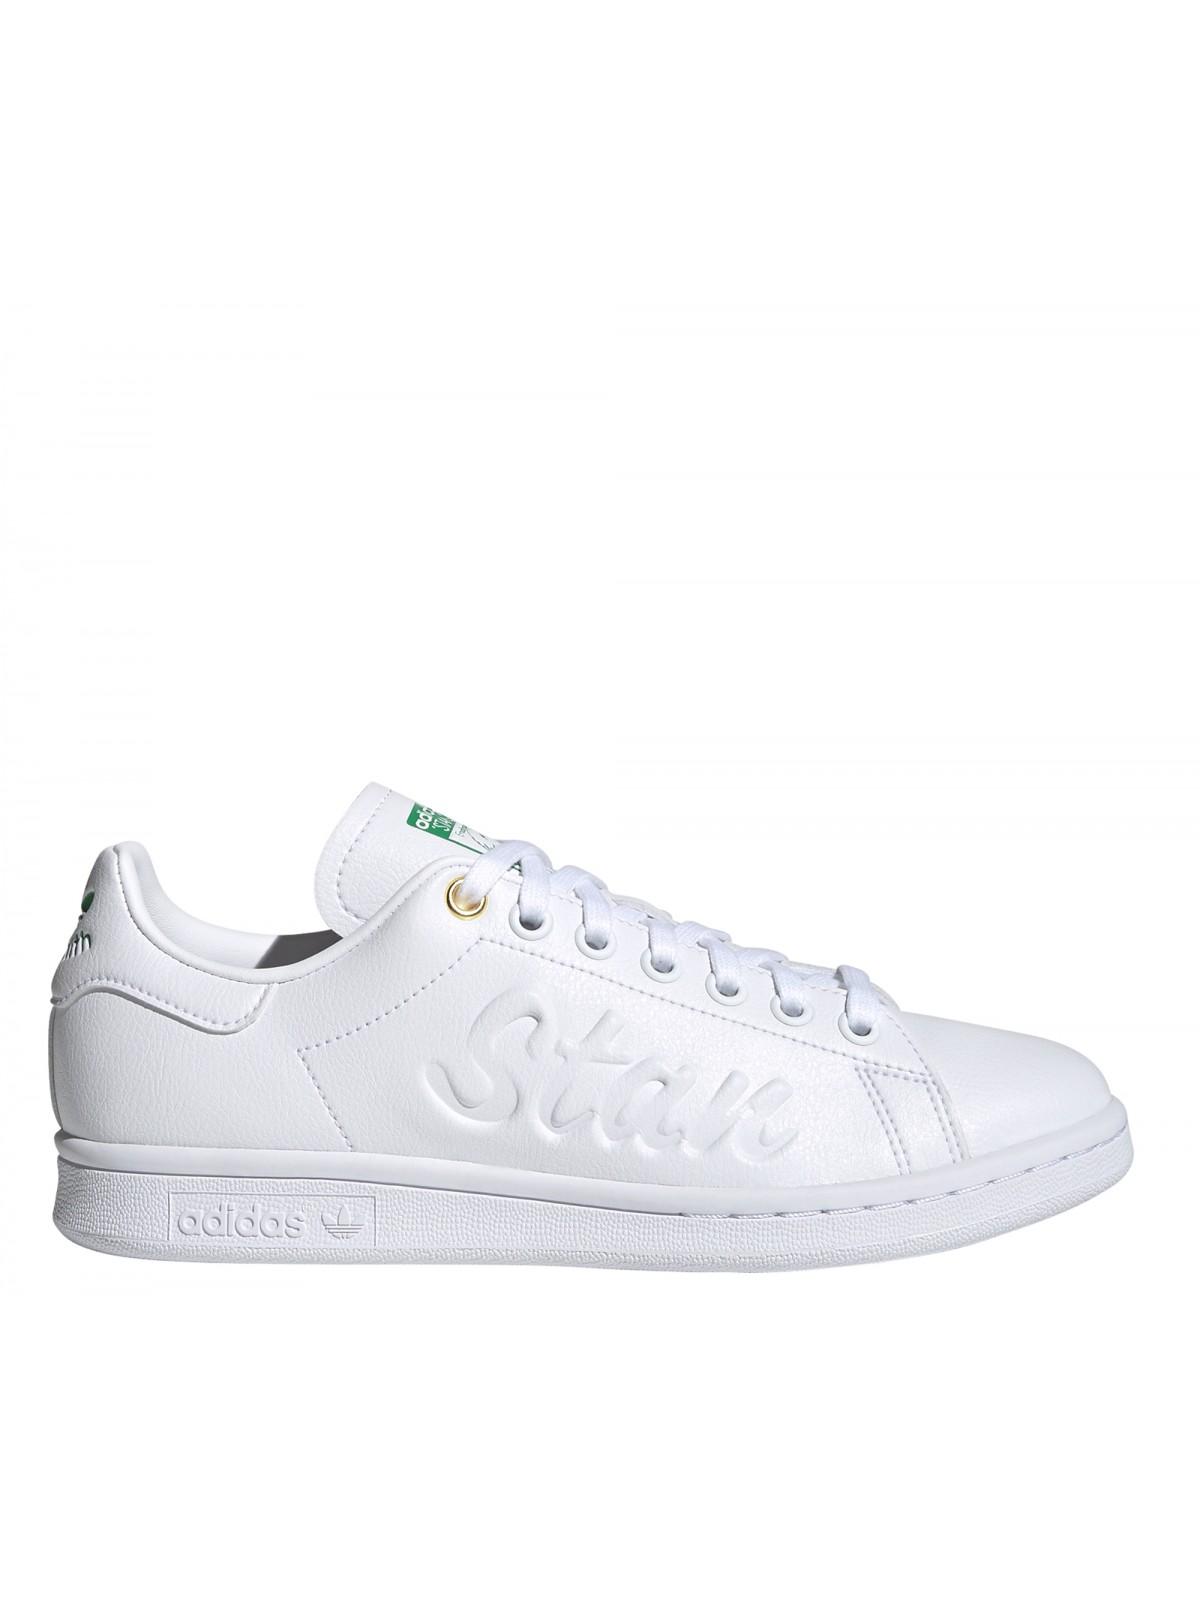 Adidas Stan Smith Primegreen Laser blanc / vert - Marques